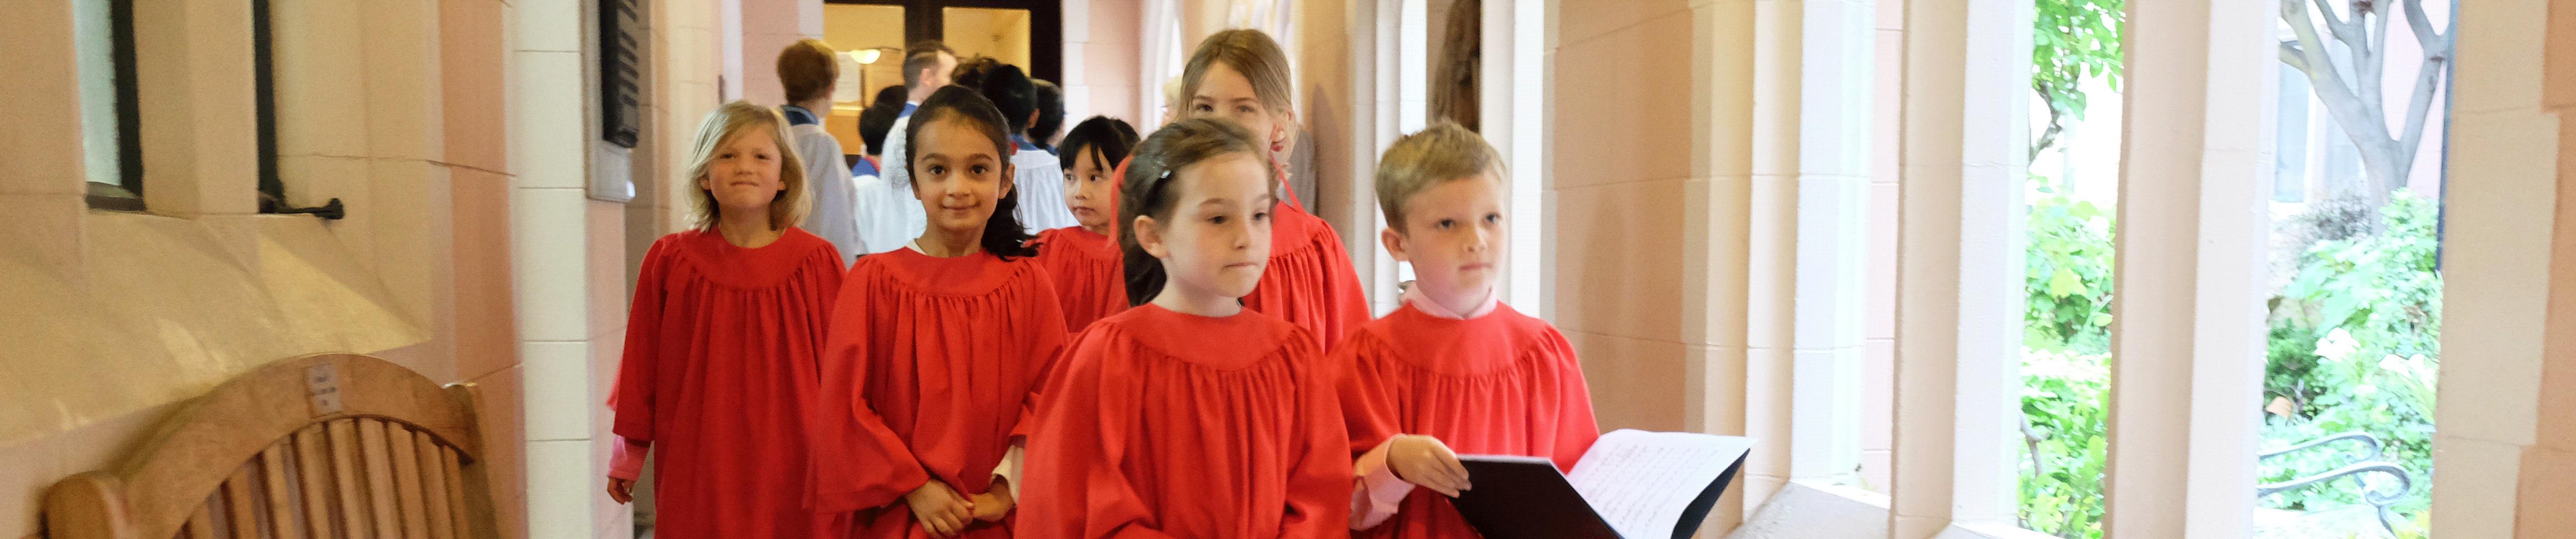 choir-kids-wide3